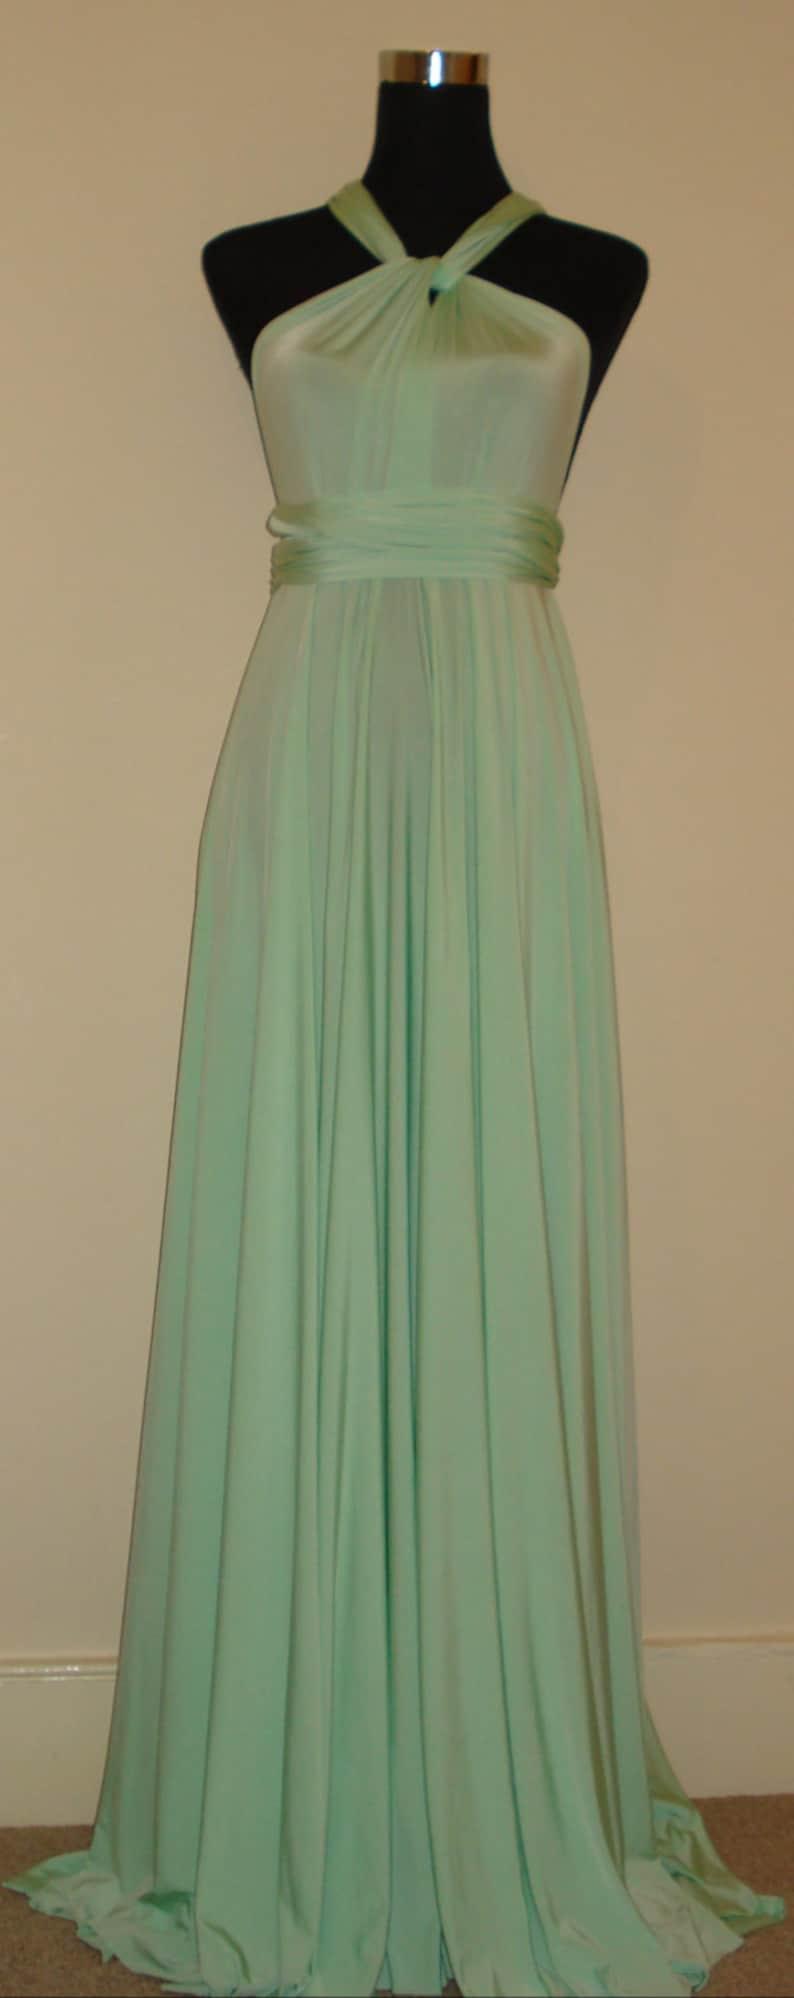 Soft mint bridesmaid dress blackless strapless dress weddings clothing dresses infinity dress multiway dress wrap twist dress formal dress